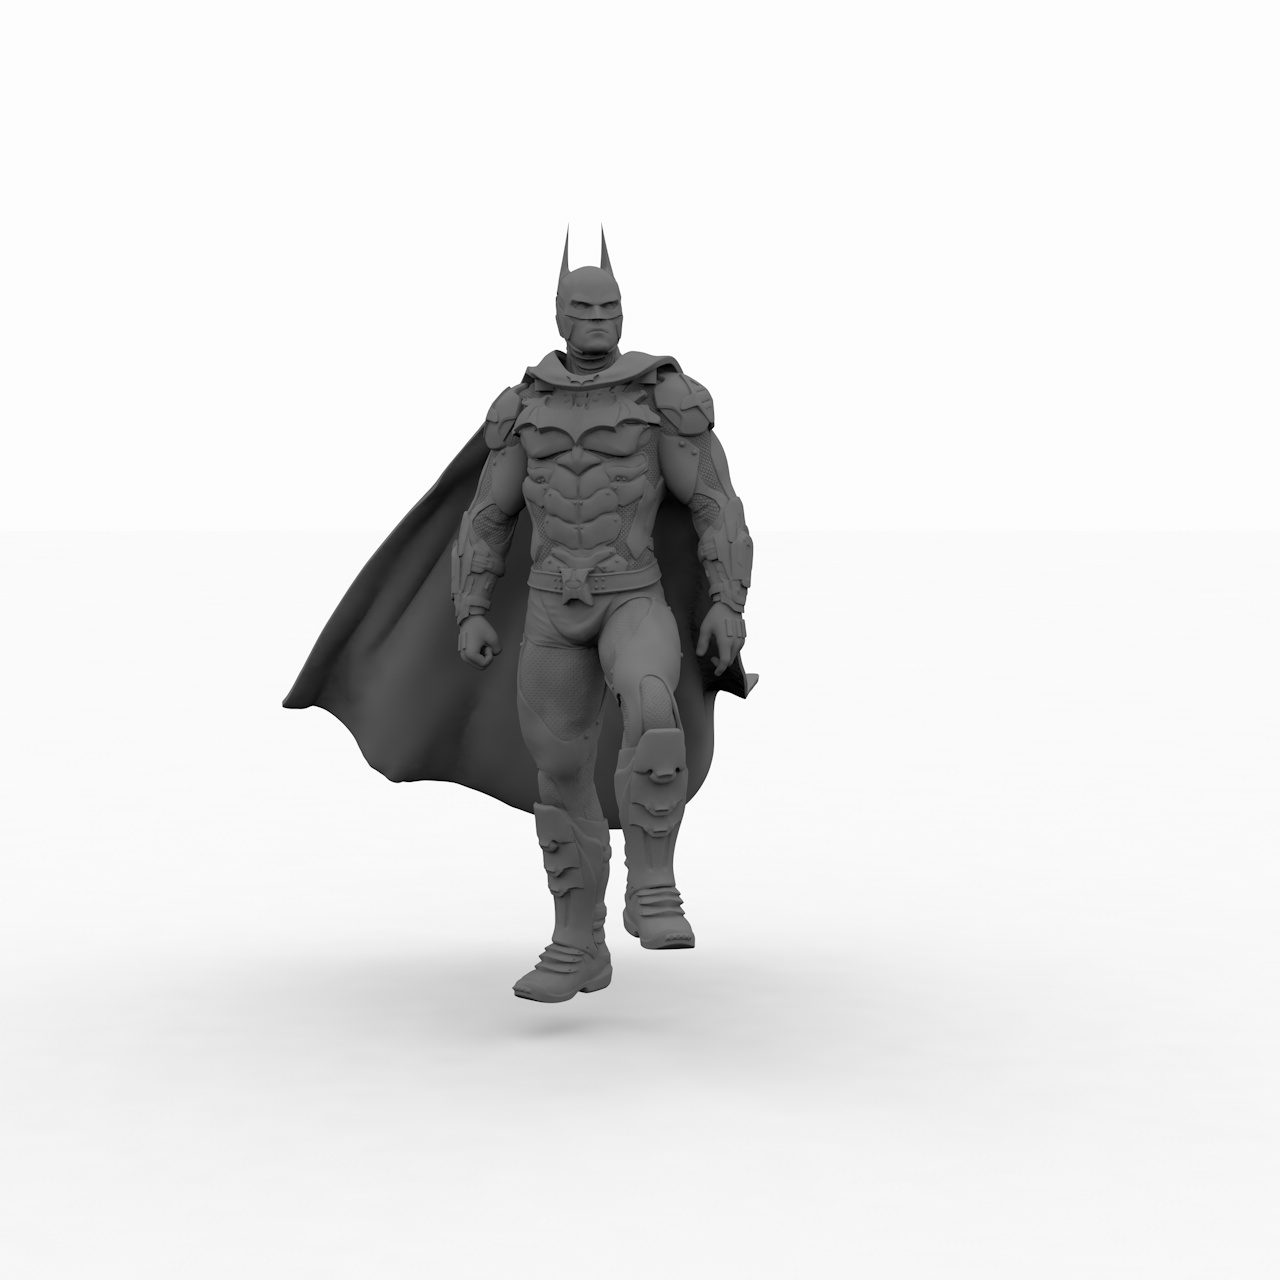 Batman 3d printing model